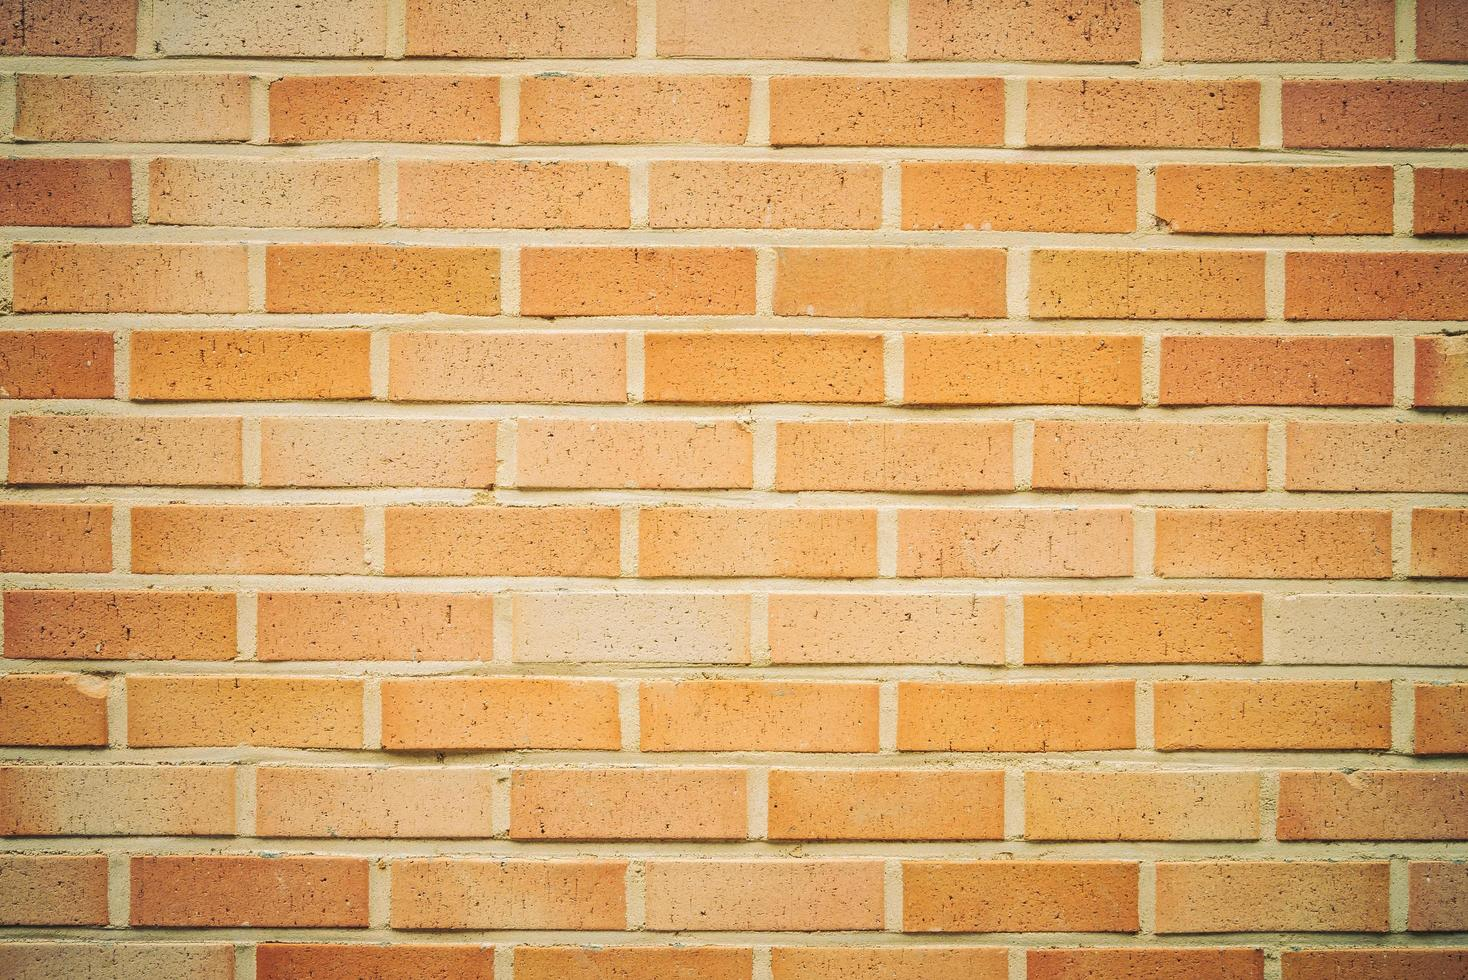 Old stone brick wall background photo